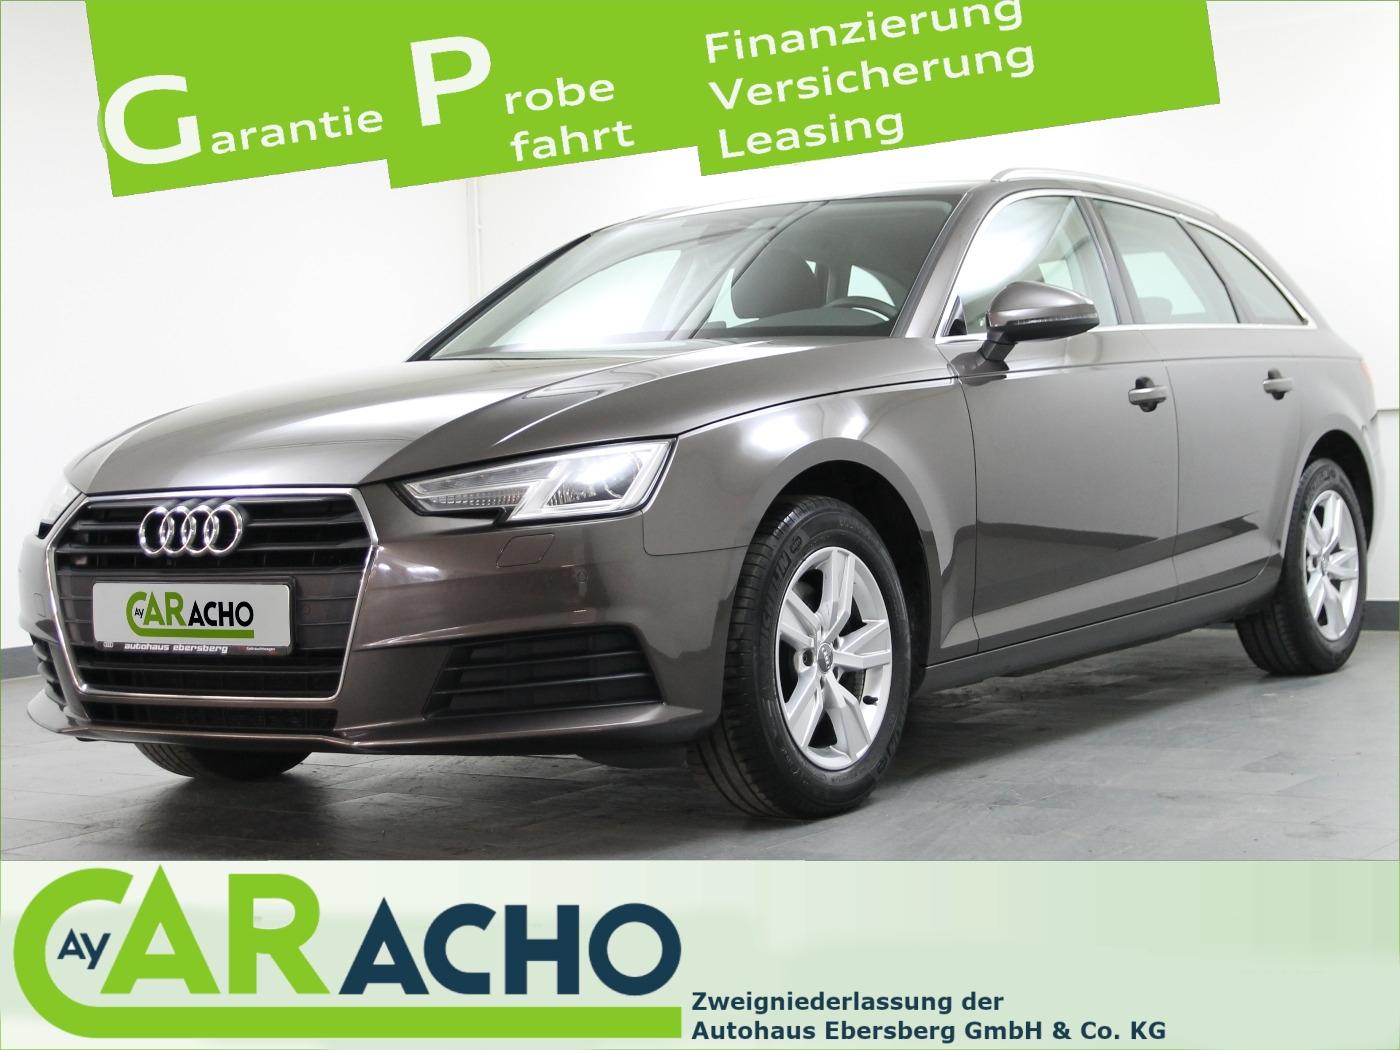 Audi A4 Avant 2.0 TDI Xen+ Nav QI PDC+ EURO6 Garantie, Jahr 2017, Diesel